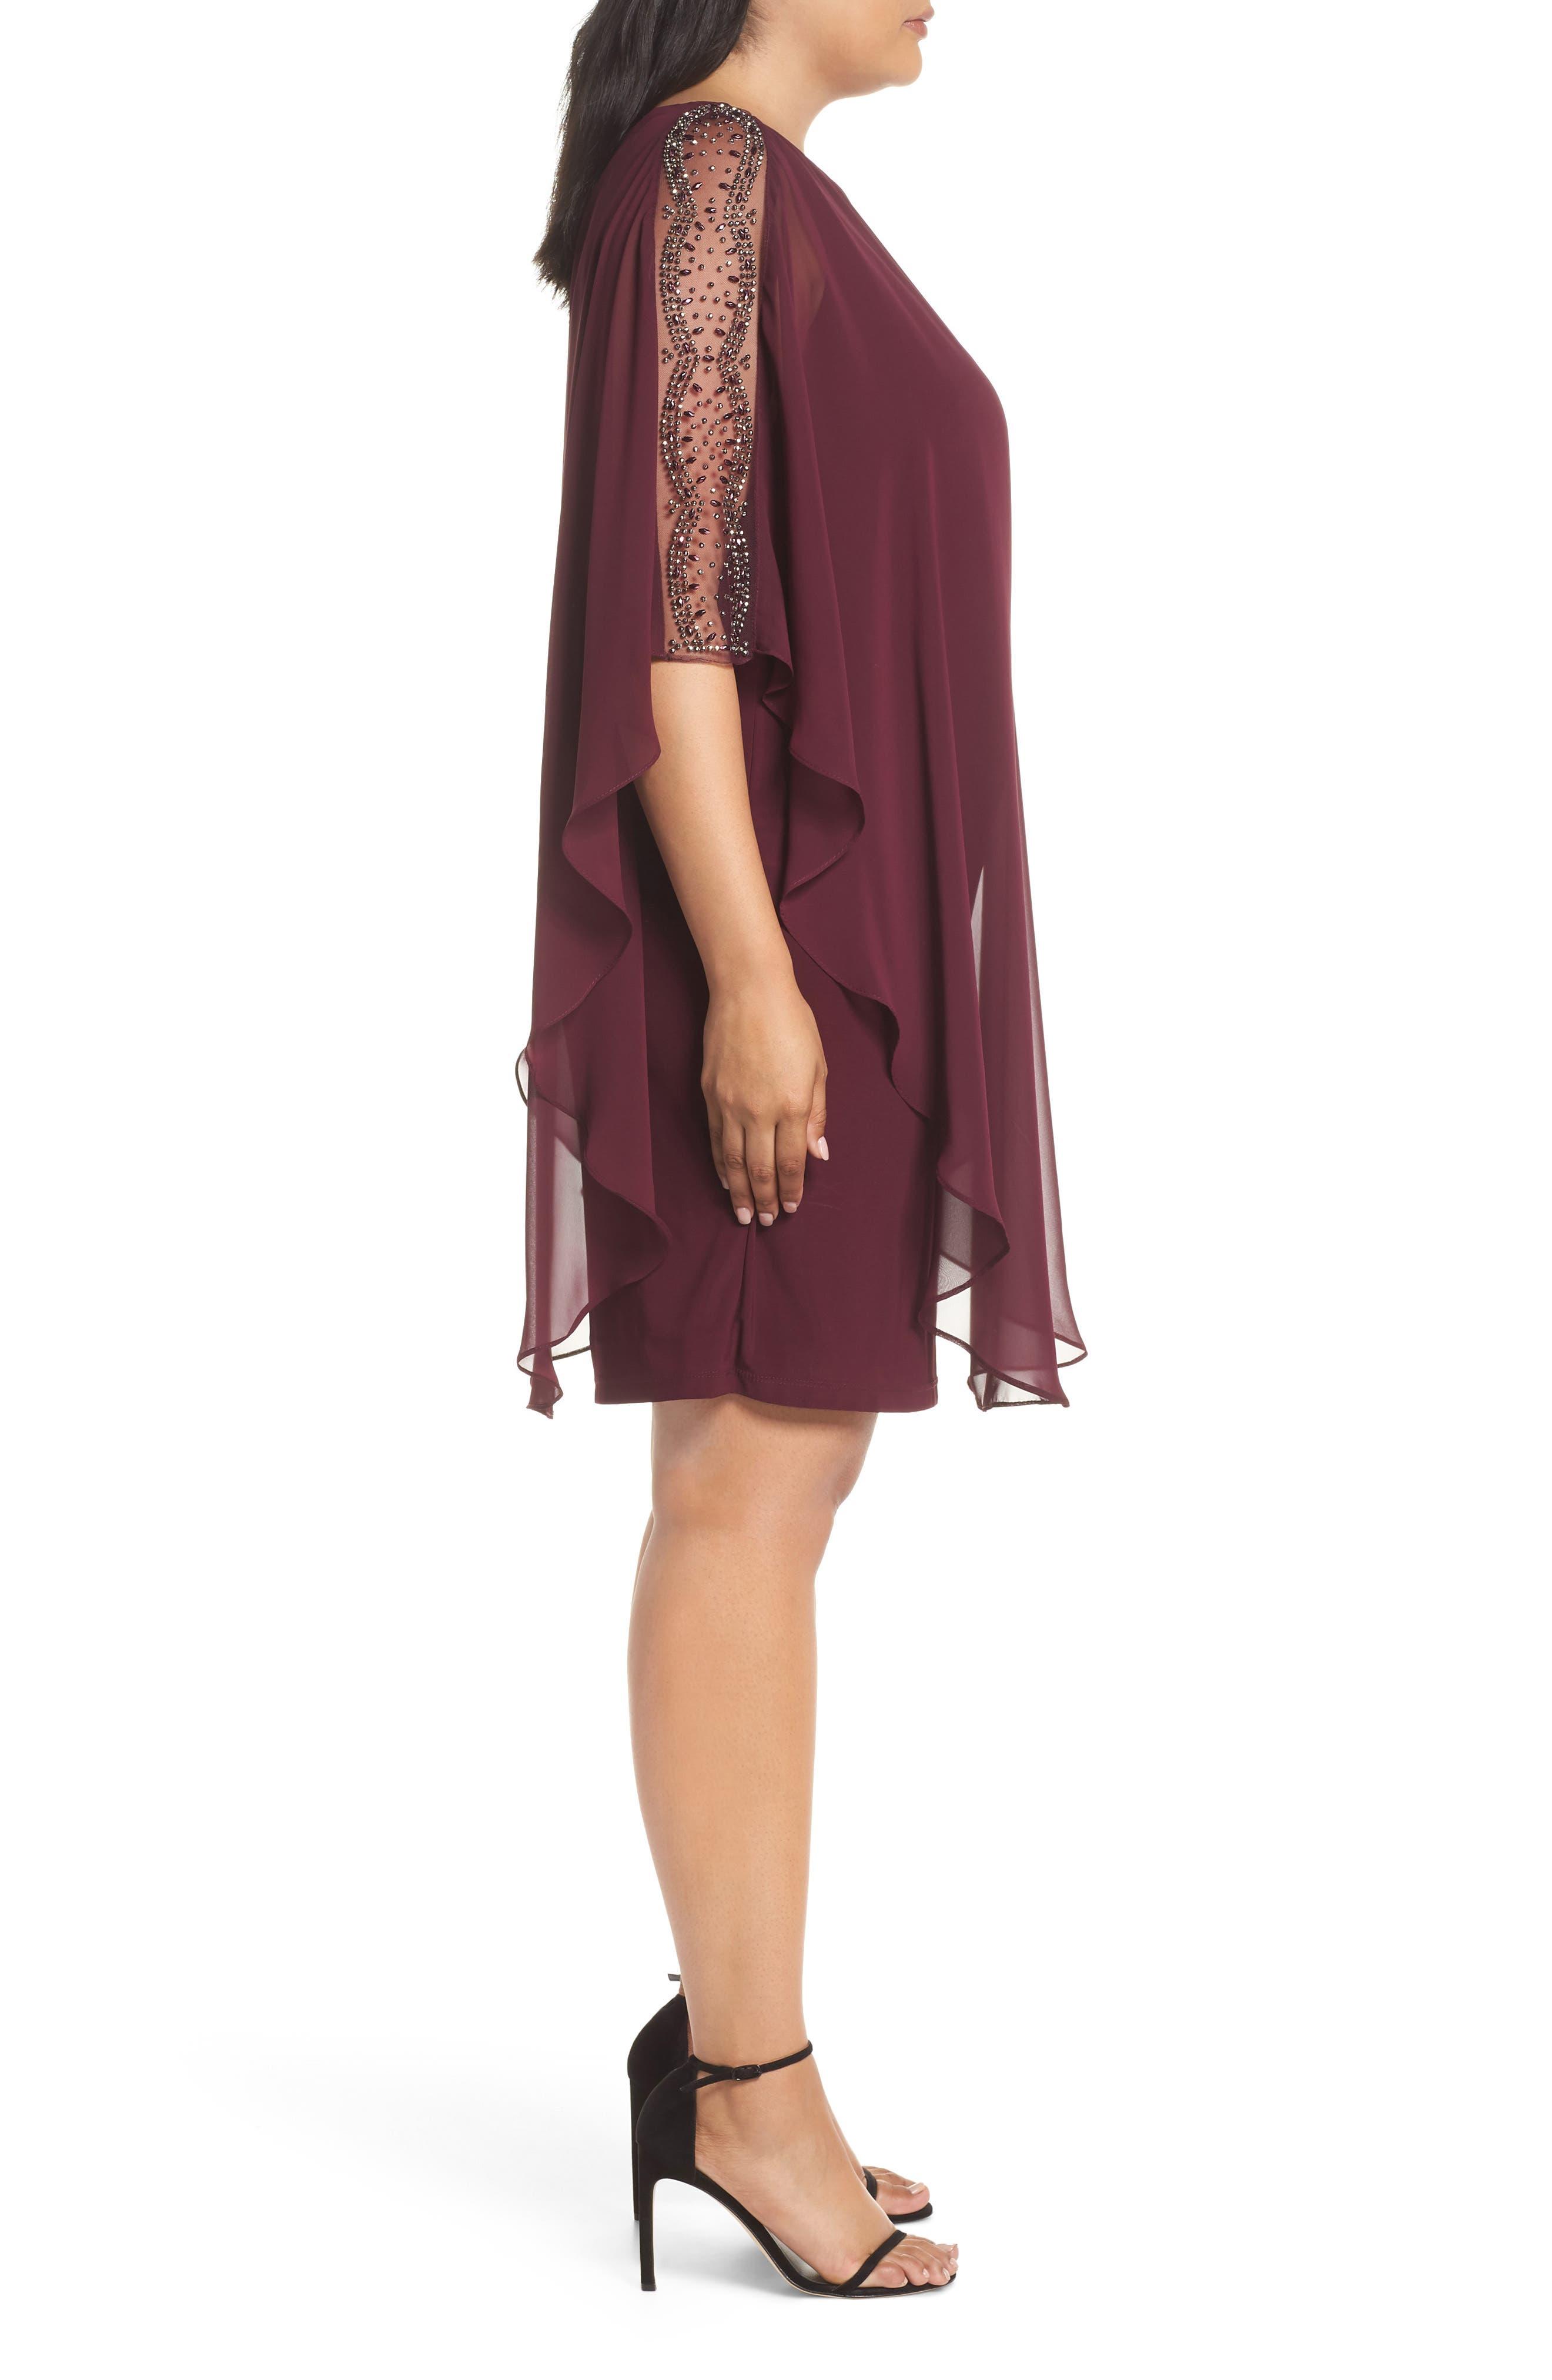 Chiffon Overlay Beaded Sleeve Cocktail Dress,                             Alternate thumbnail 3, color,                             WINE